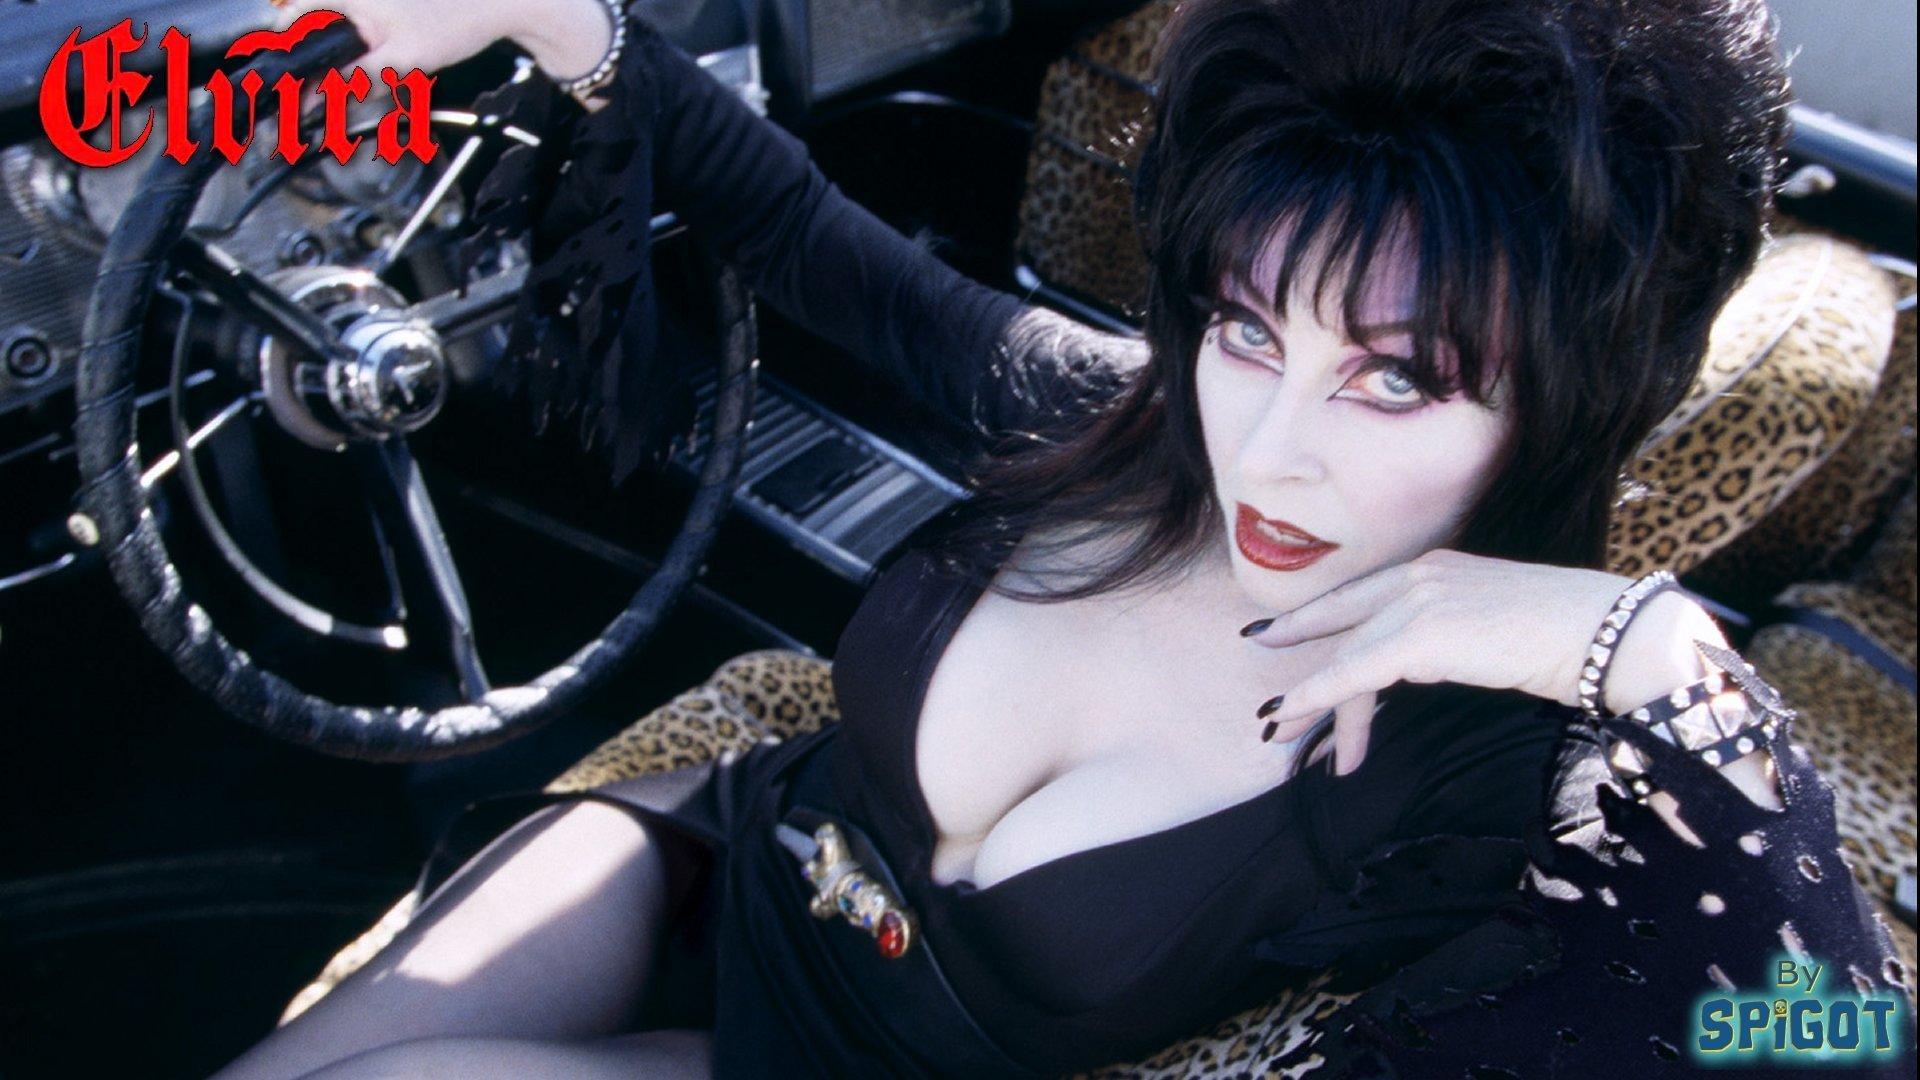 Elvira Elvira 1920x1080